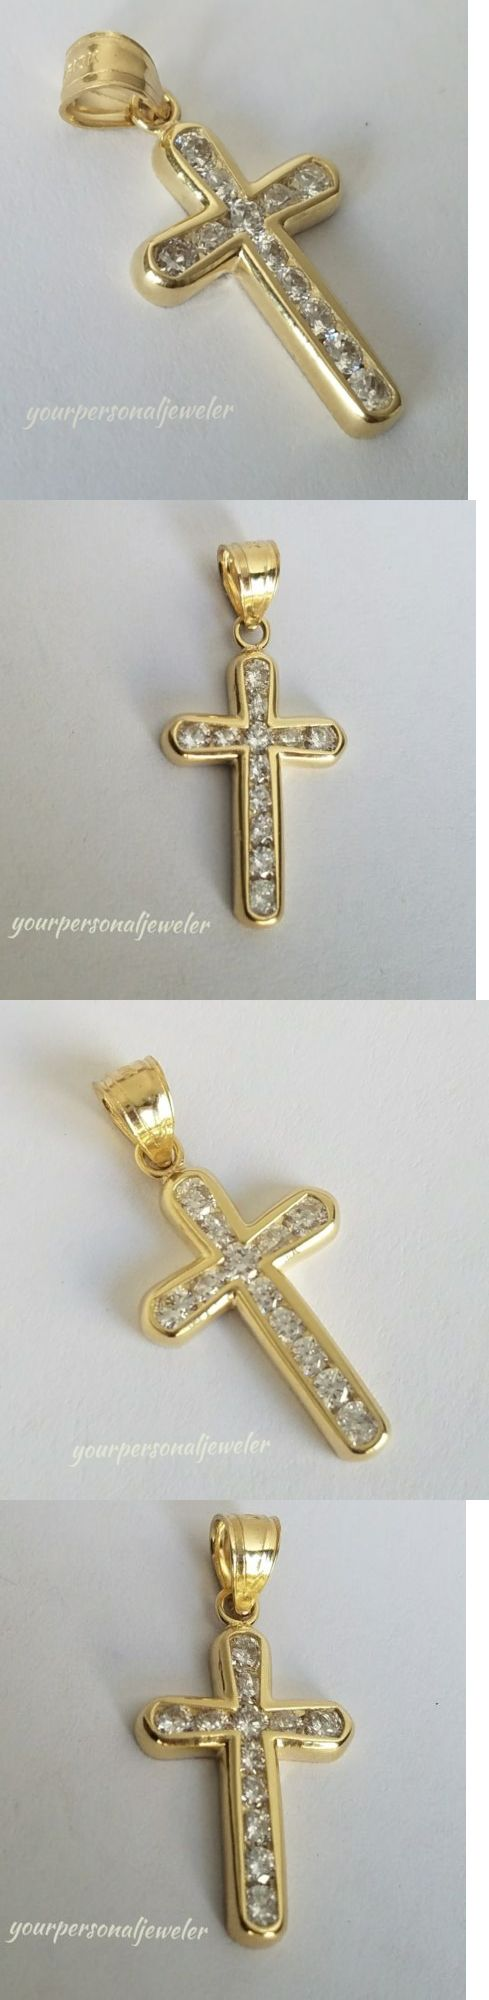 Diamond 164331: .40 Carat Man Made Diamond 10K Yellow Gold Cross Pendant 1 Inch Long -> BUY IT NOW ONLY: $79.99 on eBay!